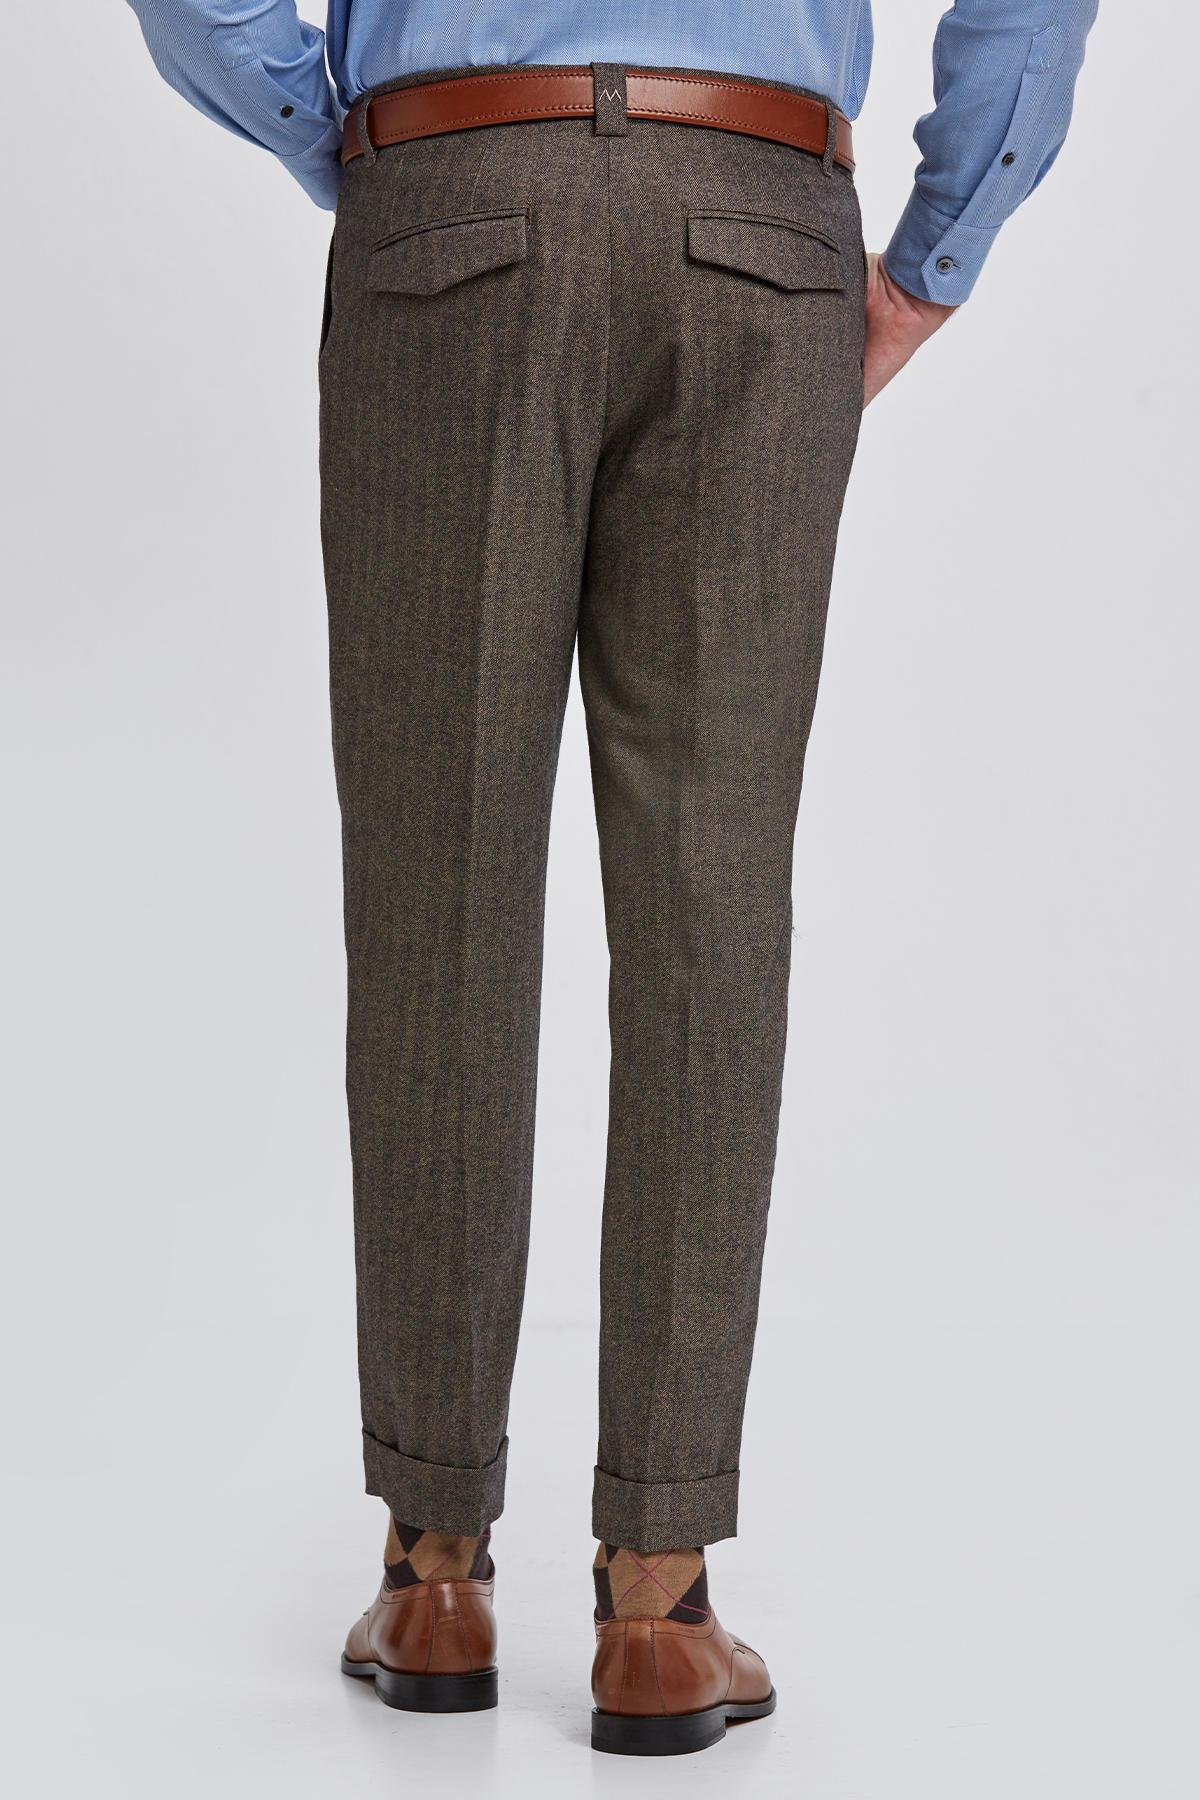 Yün Kaşmir Kum Rengi Chino Pantolon